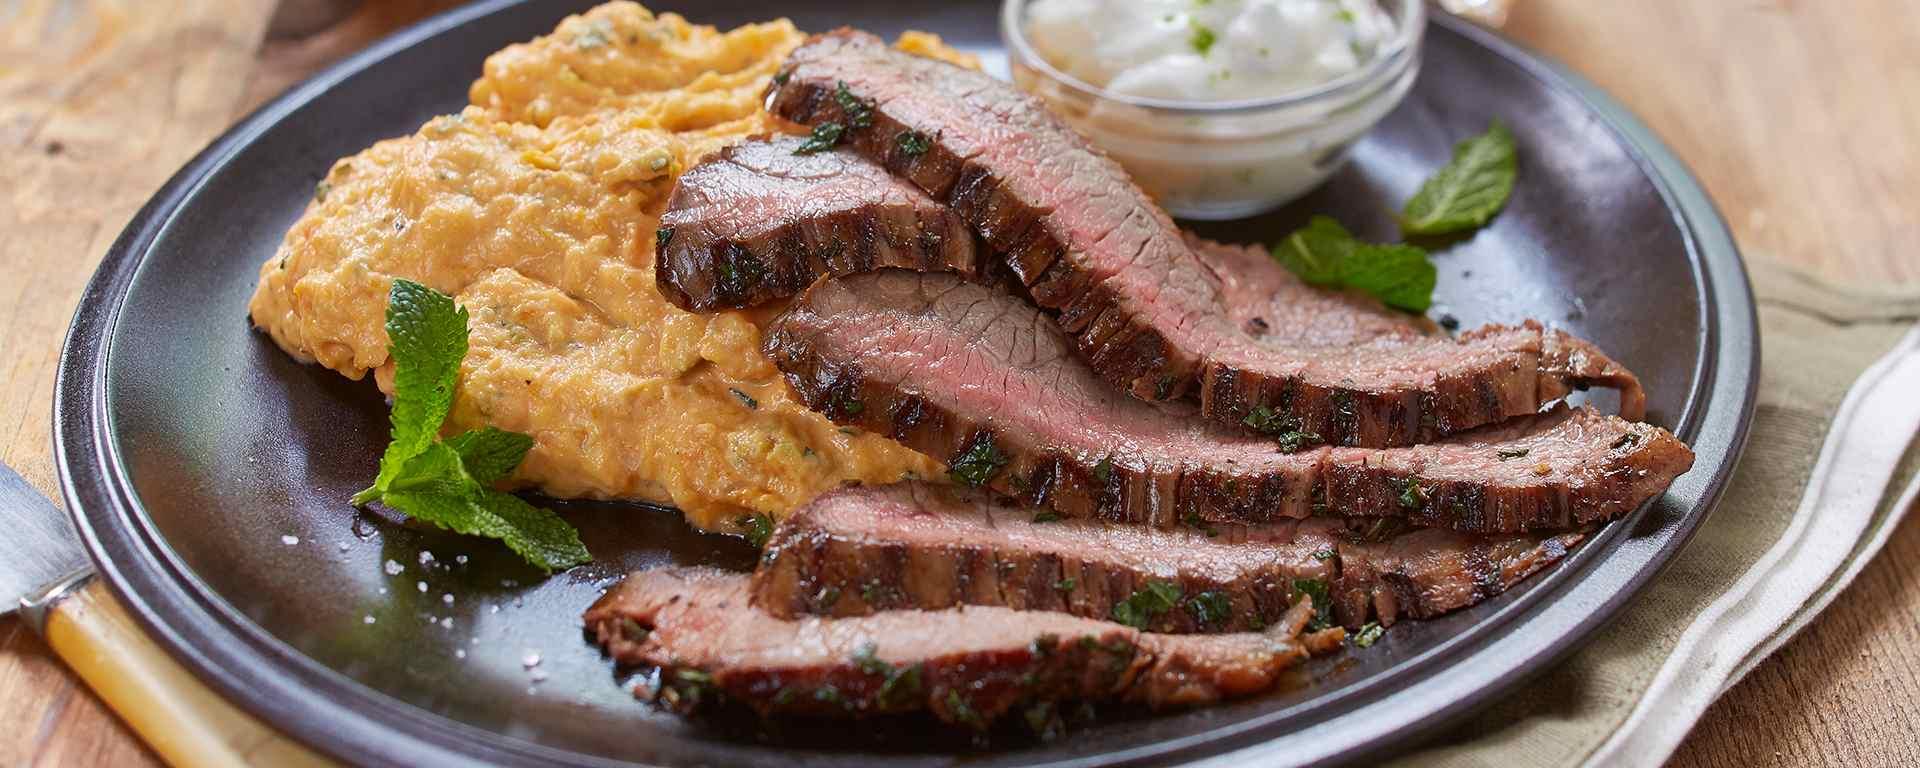 Photo for - Mojito Flank Steak with Sweet Potato Mash